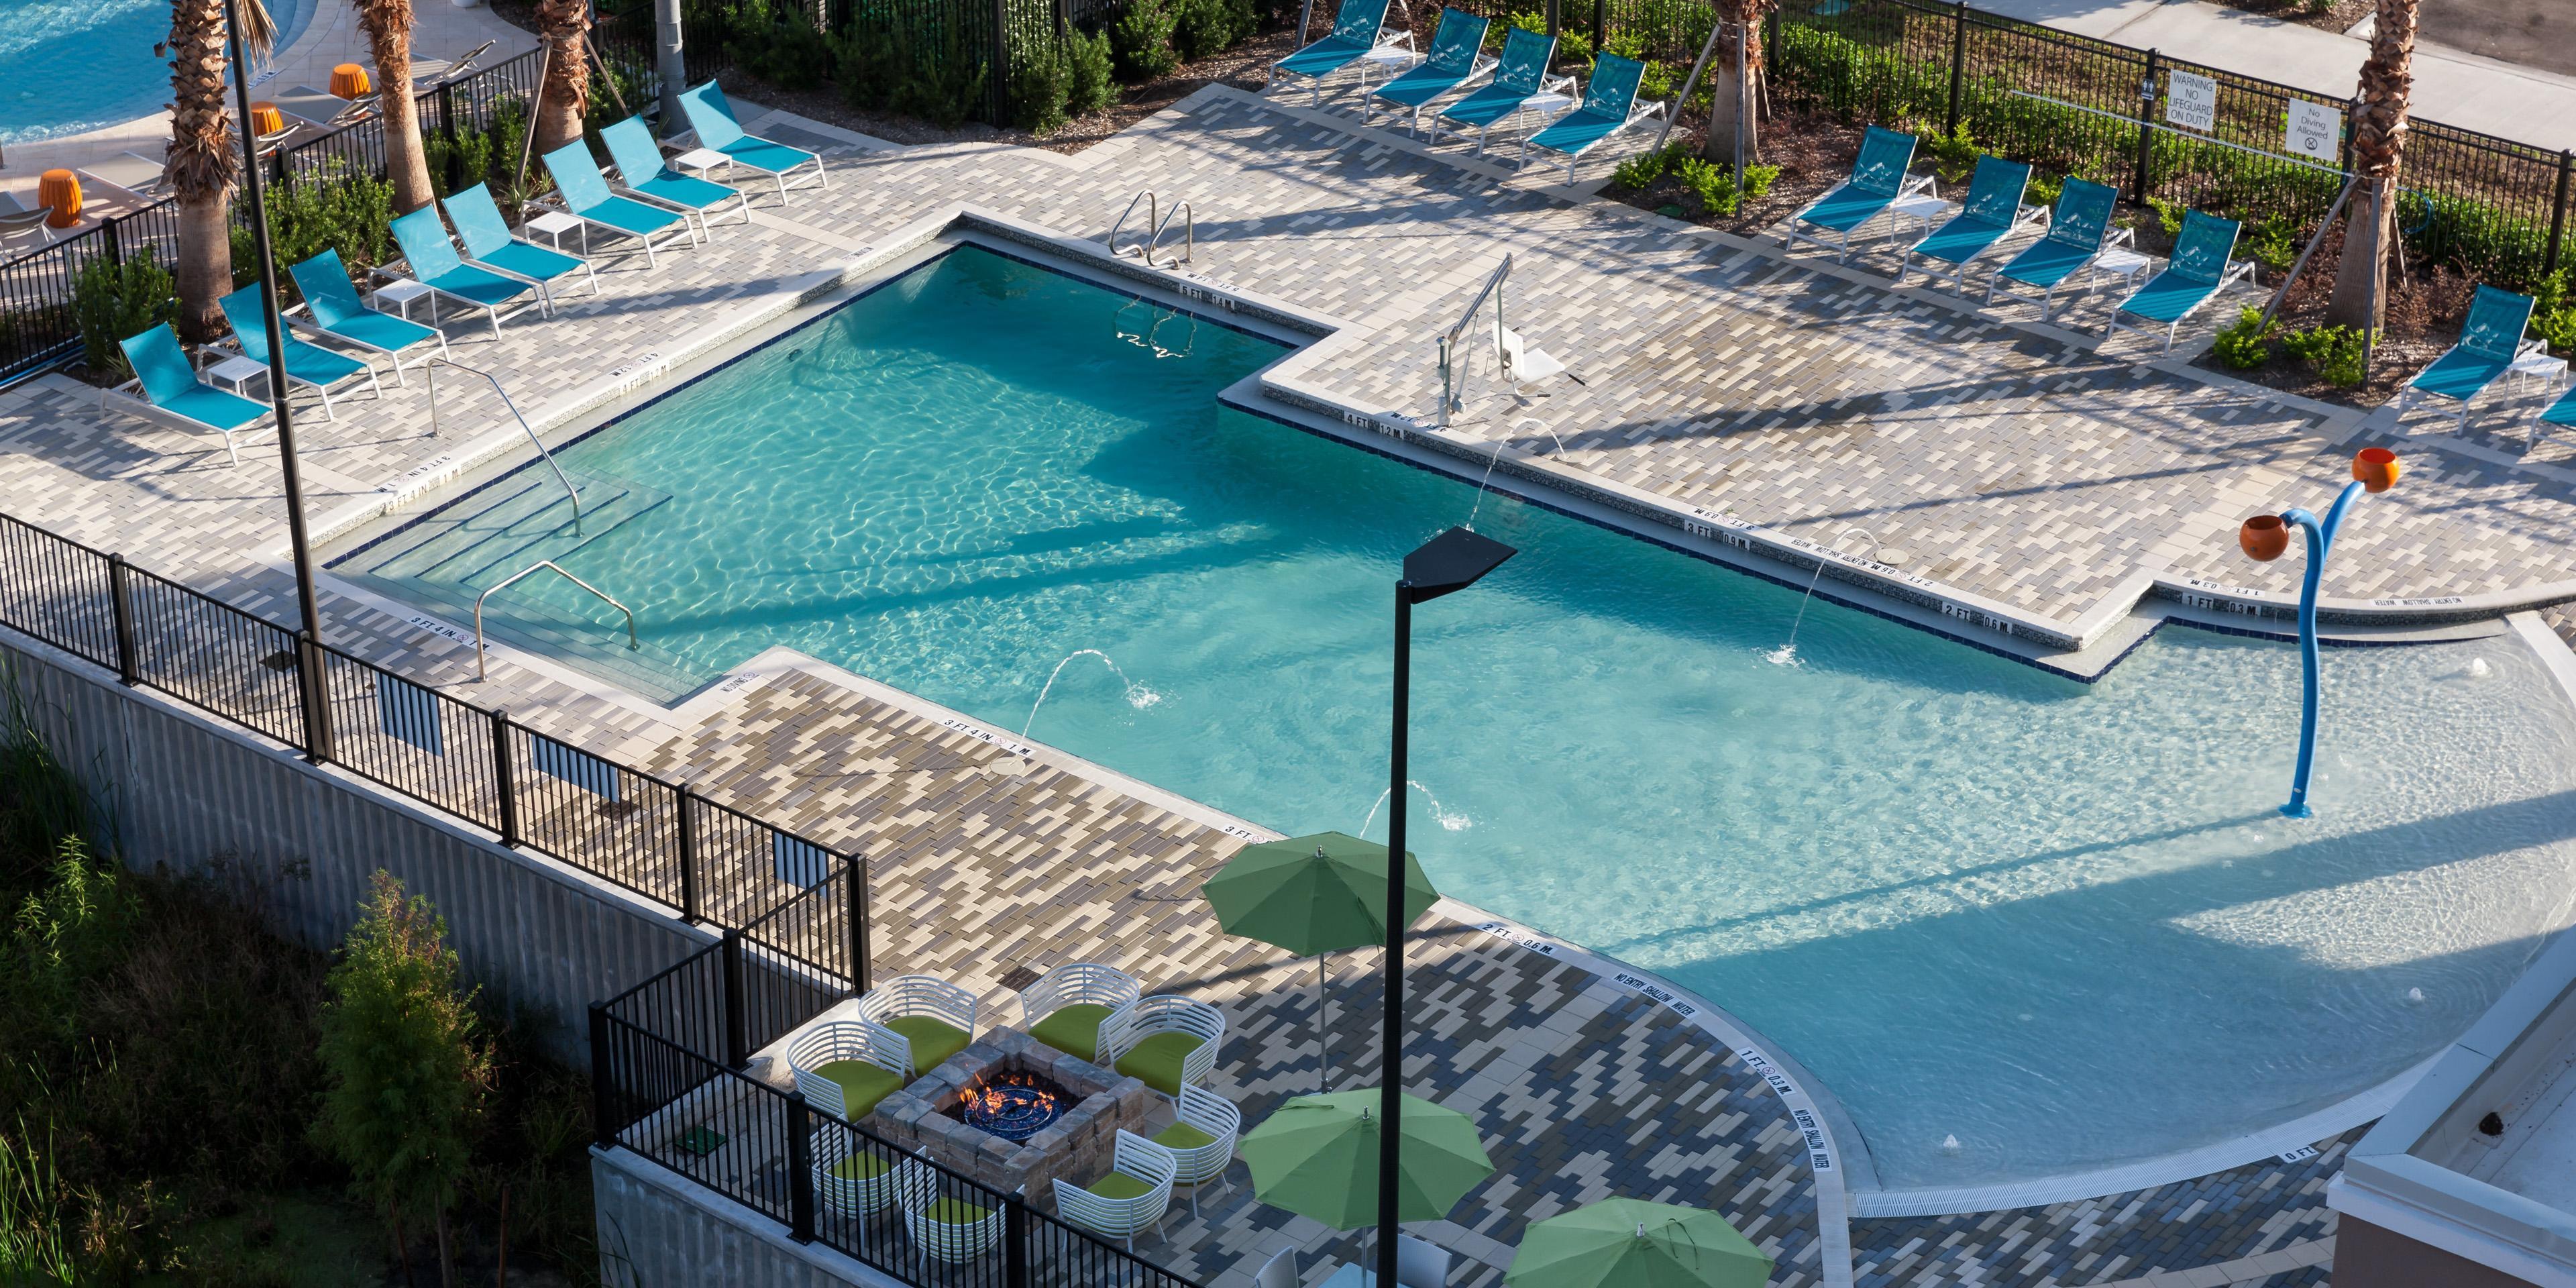 Holiday Inn Express & Suites Orlando At Seaworld Hotel in Orlando by IHG